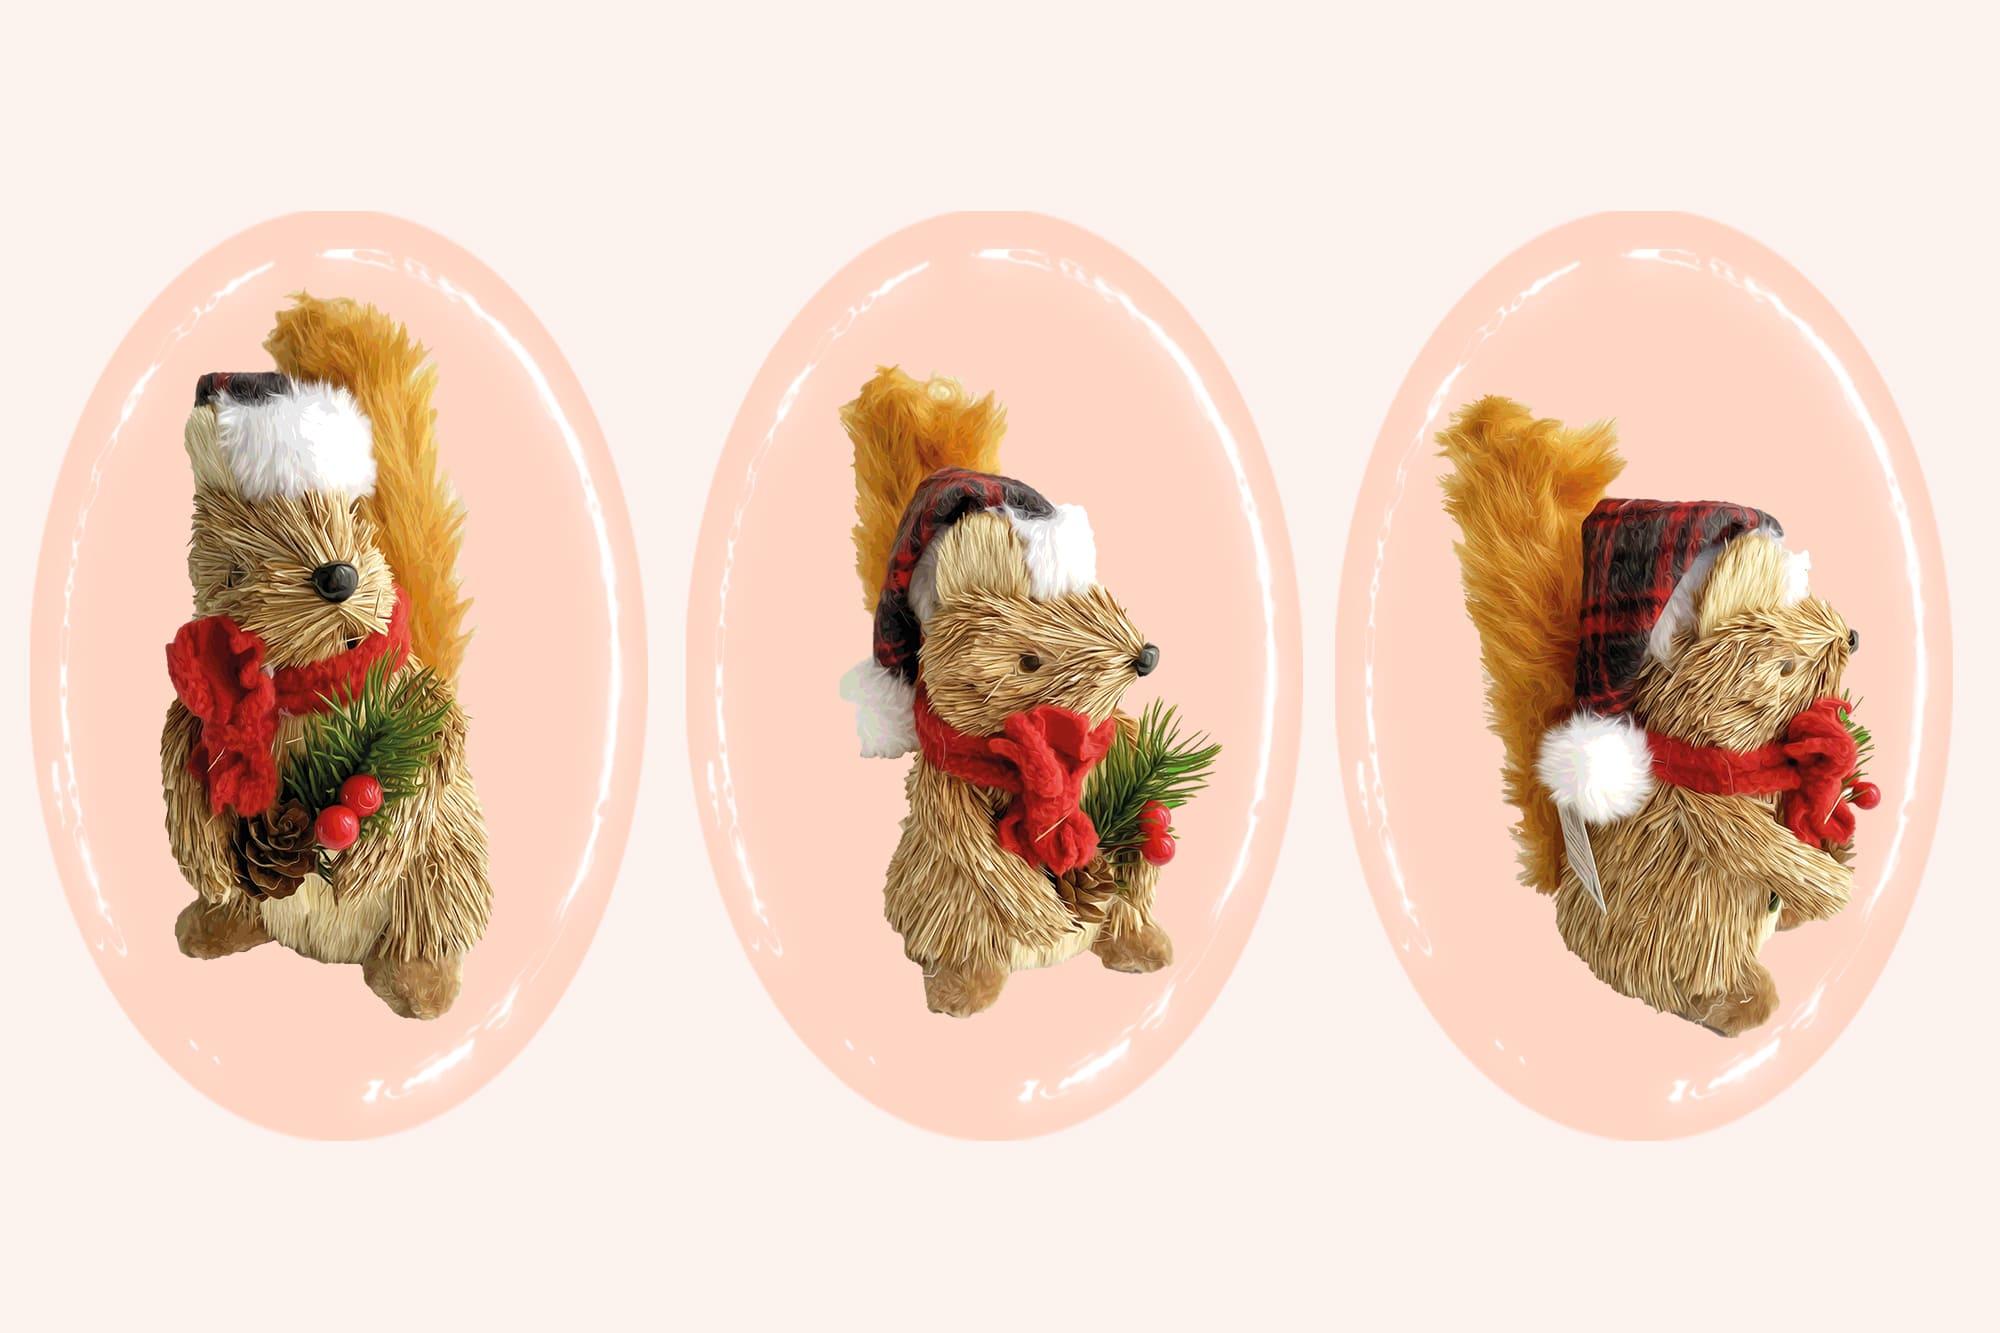 496 Christmas Illustrations: Christmas Vectors Bundle SVG, EPS, AI - Squirrel c